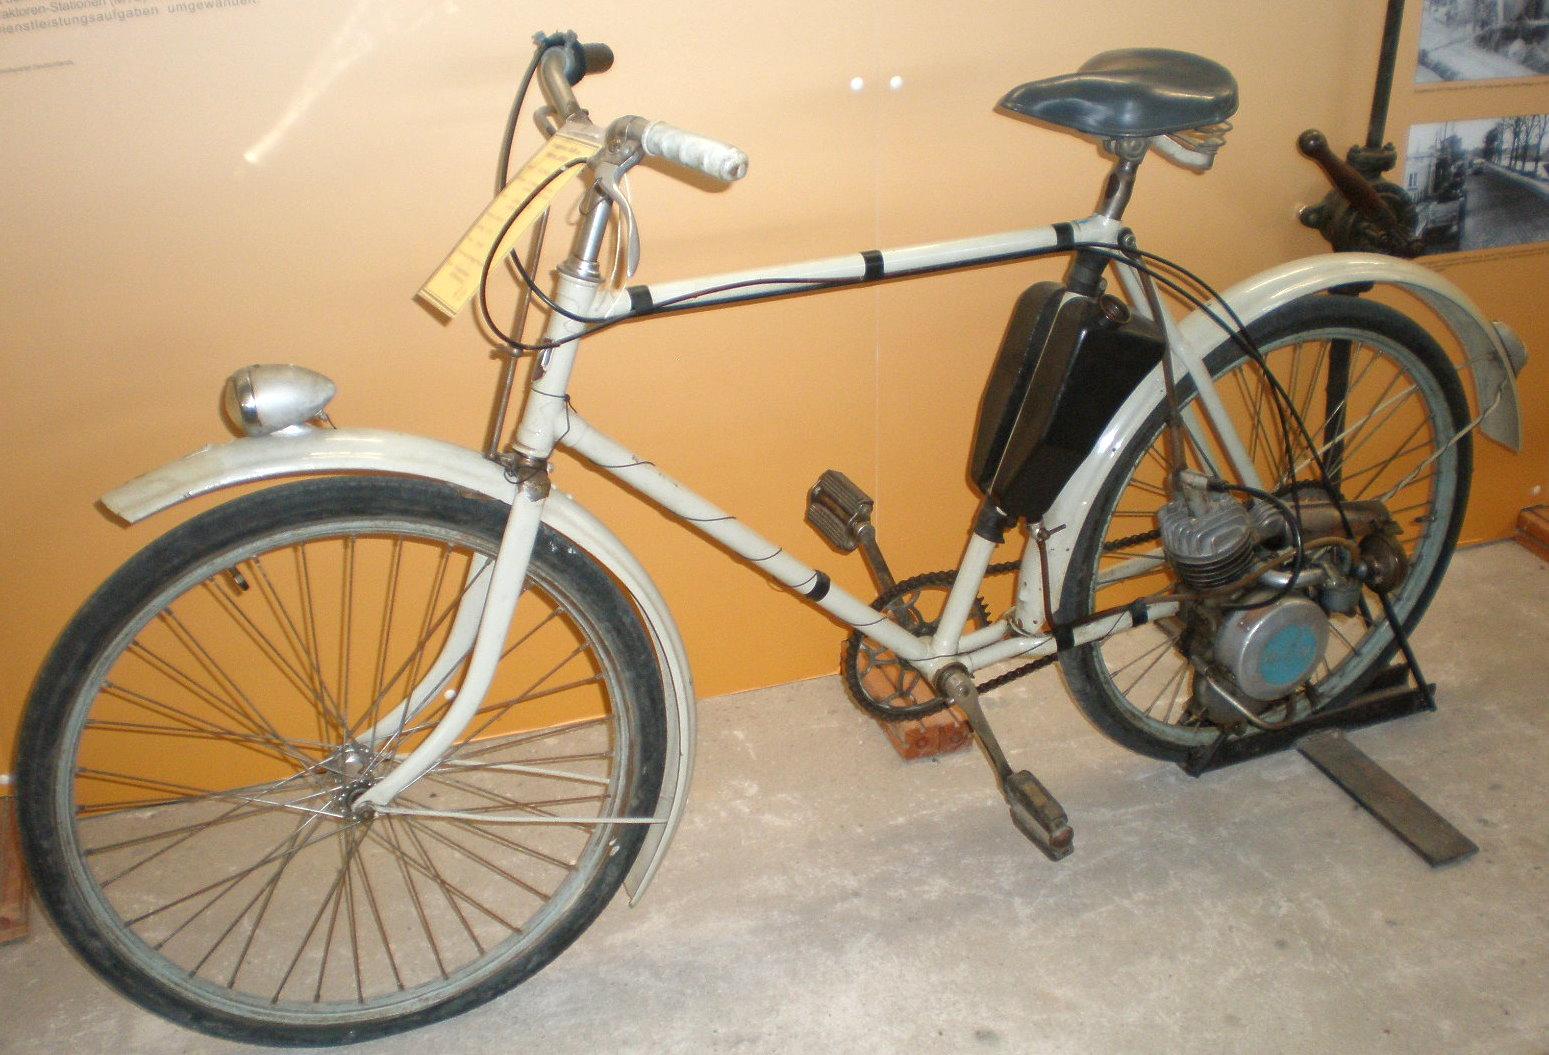 h hnerschreck aus der ddr fahrrad mit hilfsmotor foto. Black Bedroom Furniture Sets. Home Design Ideas